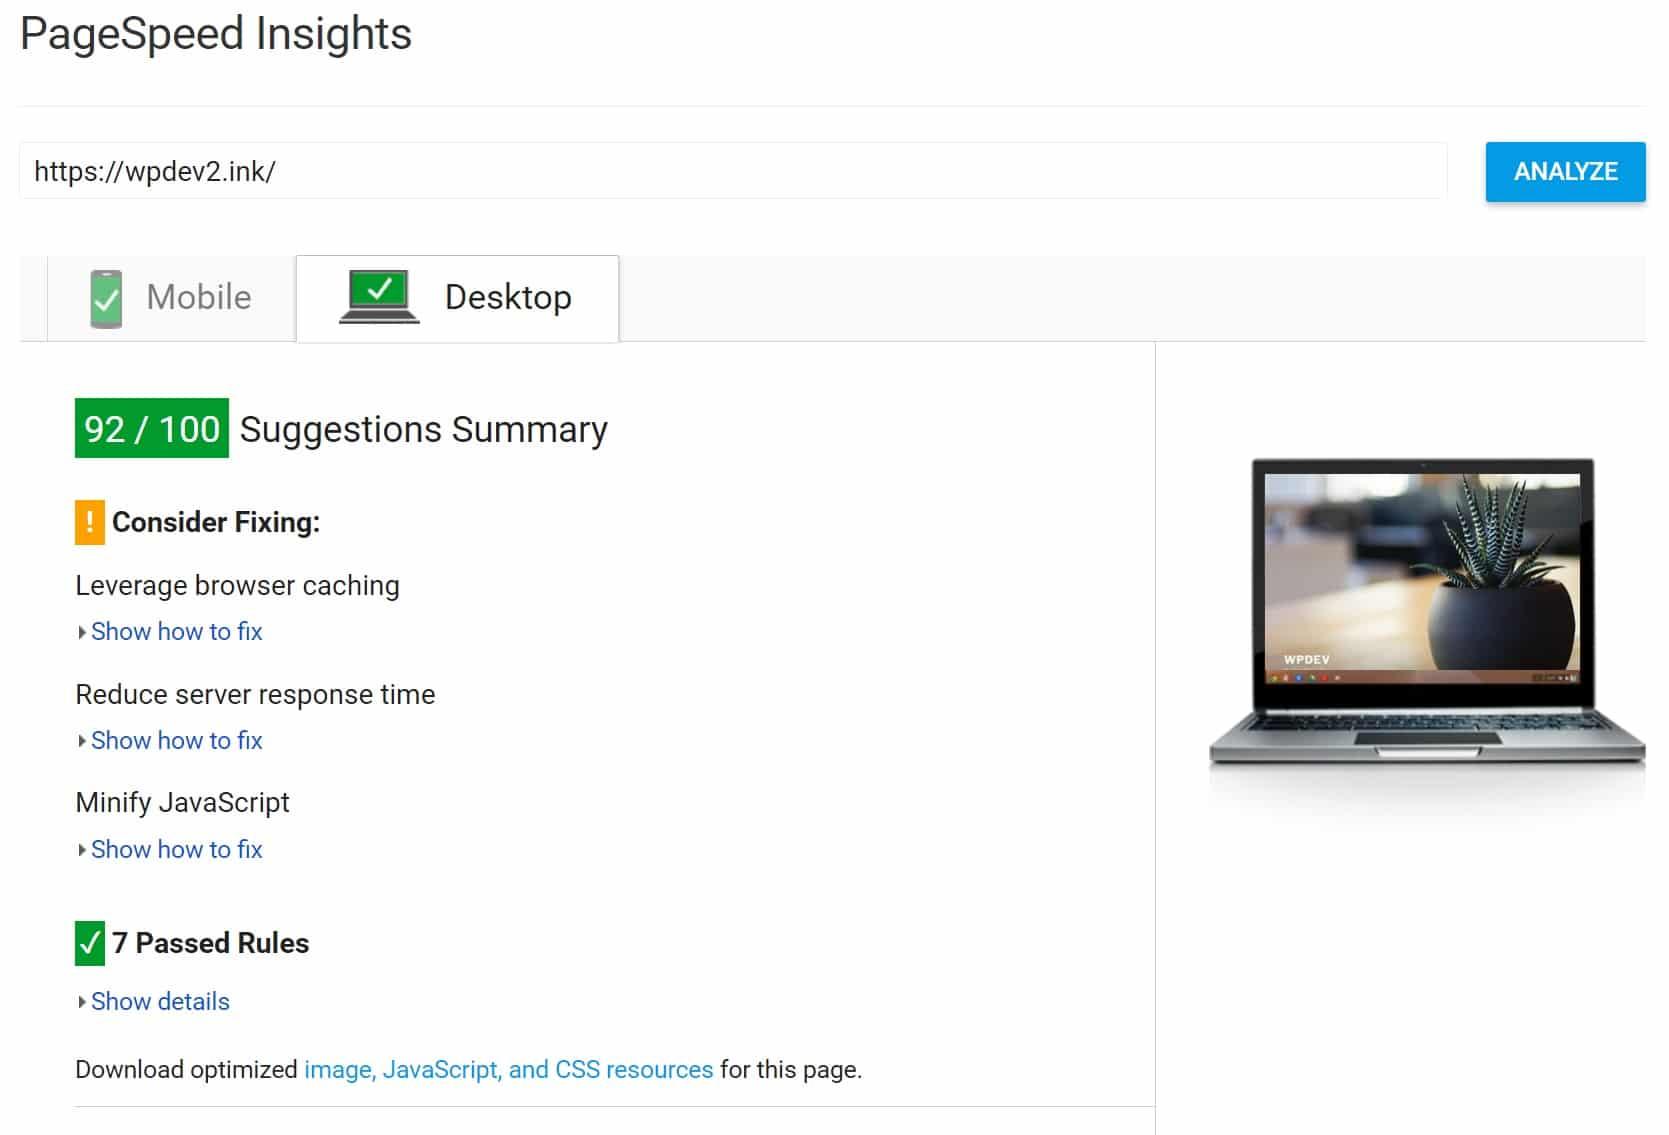 JSとCSS最適化後のPageSpeed Insightsの点数